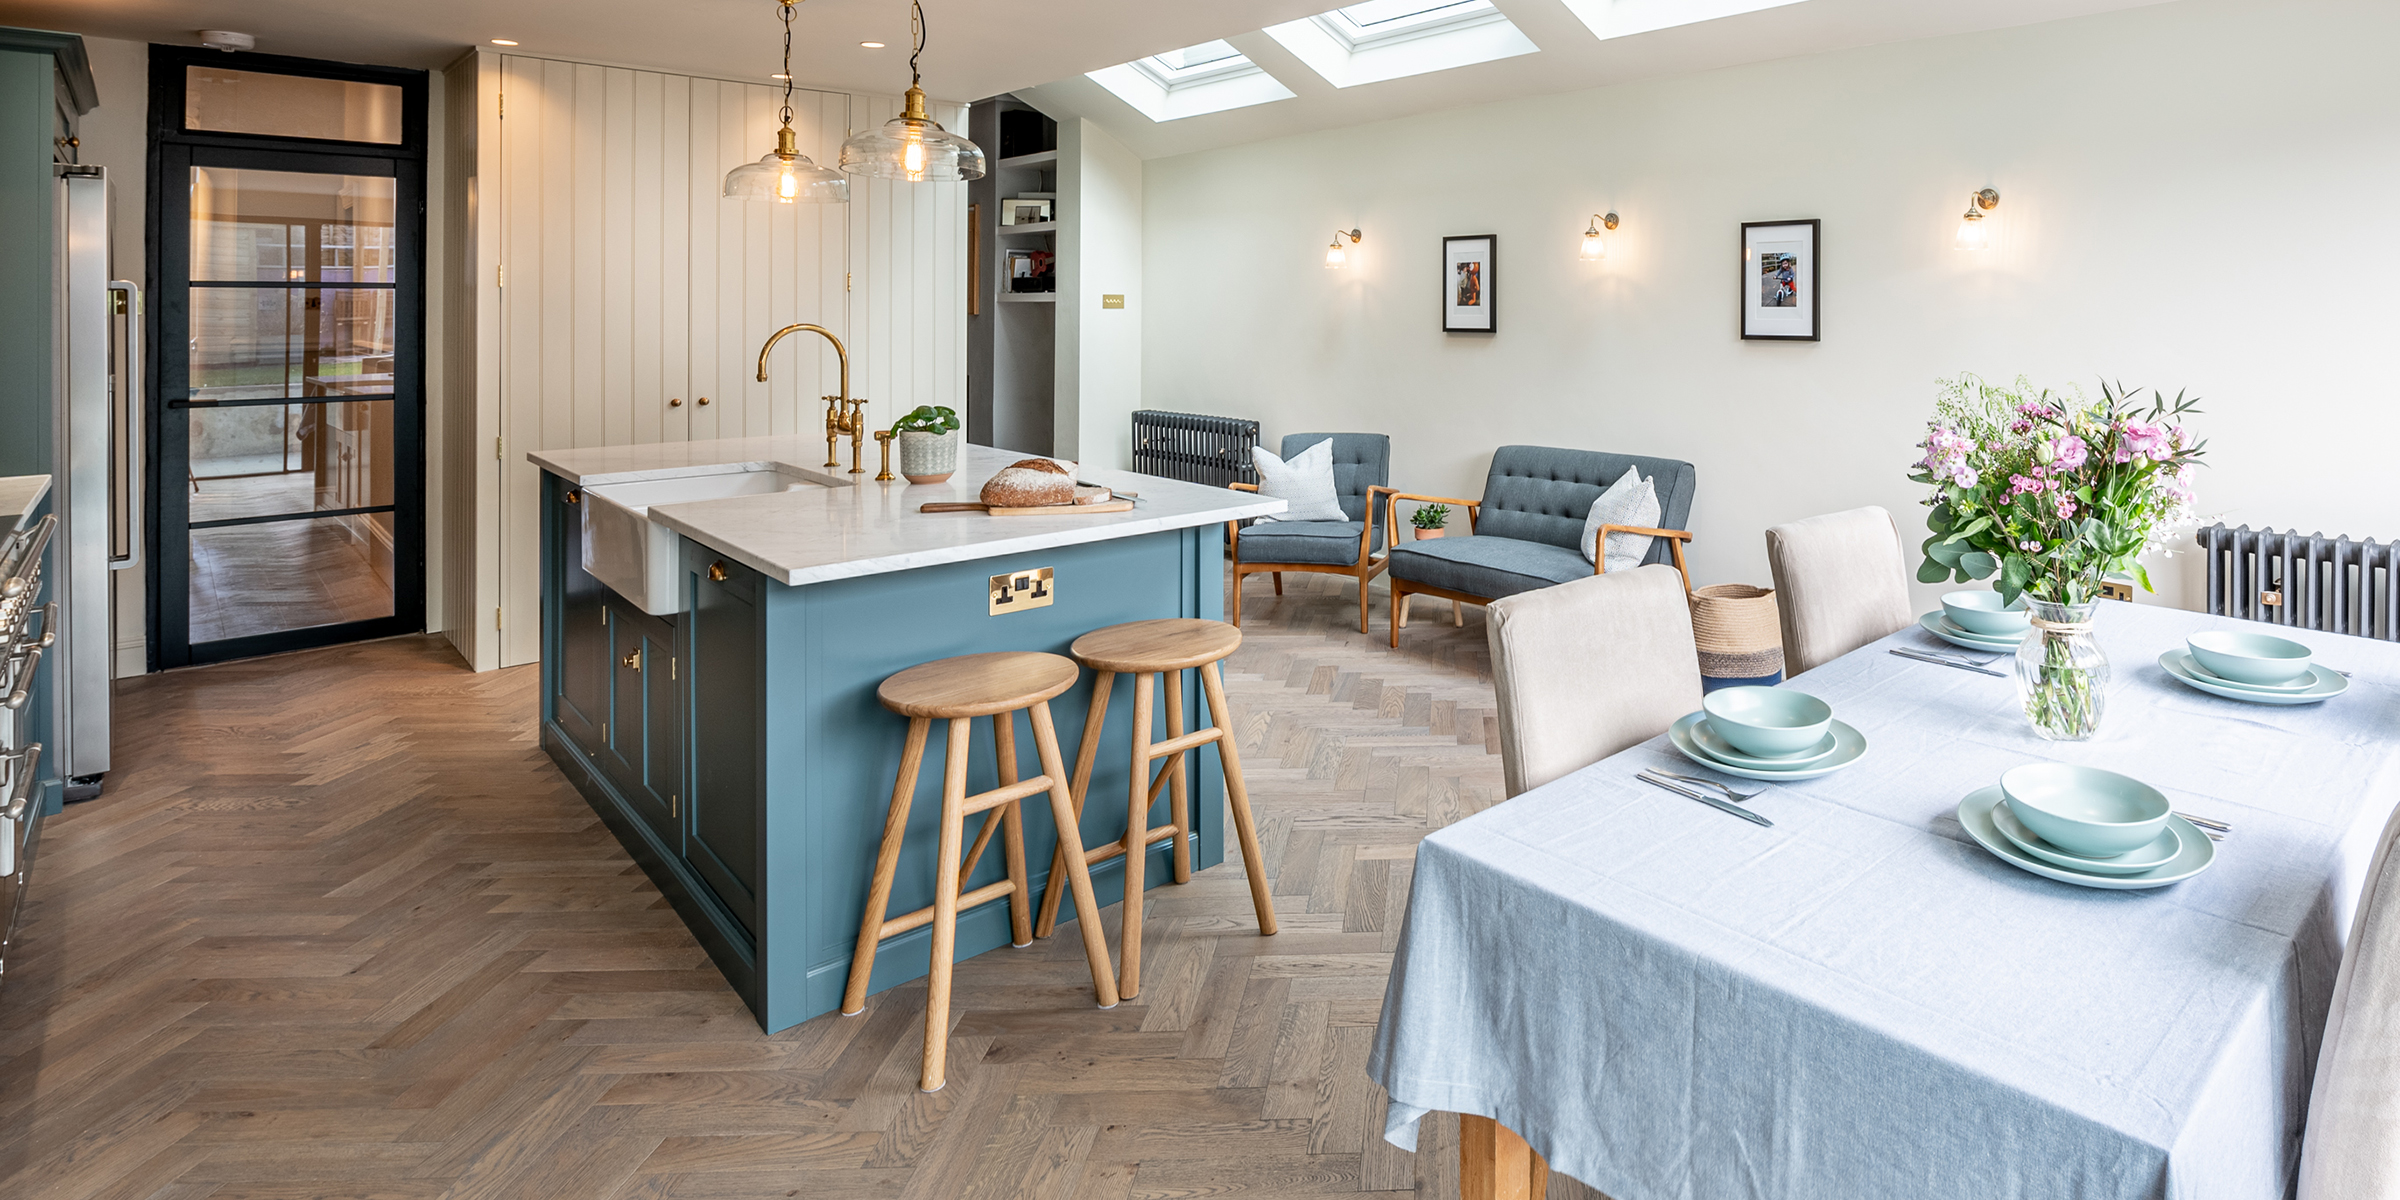 kitchen design with herringbone floors